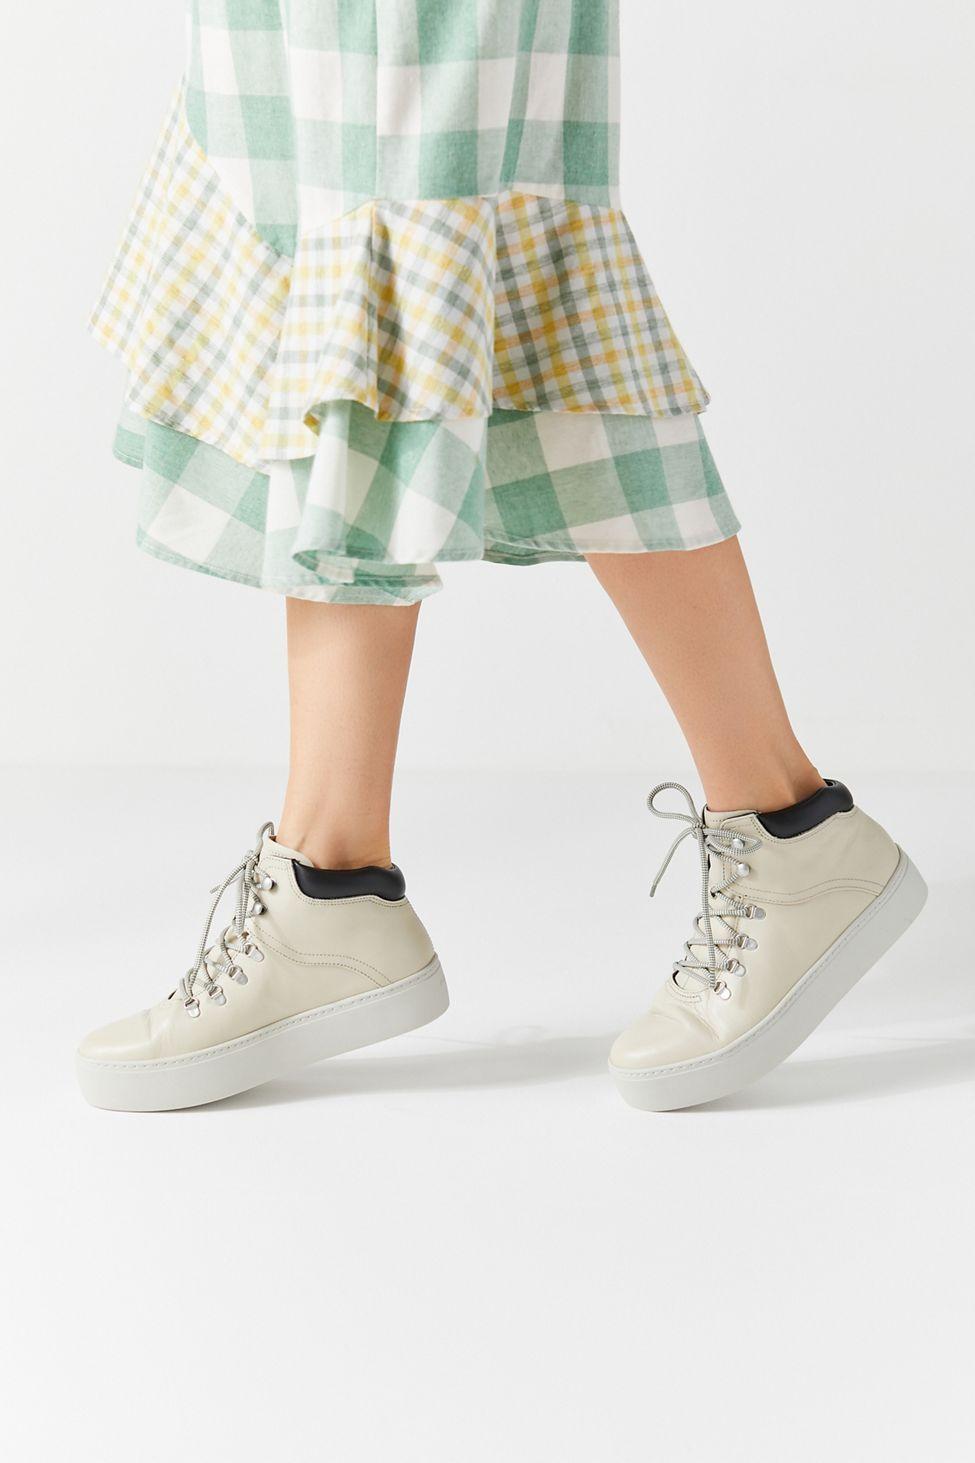 Vagabond Shoemakers Jessie Hiker Boot | Boots, Black friday